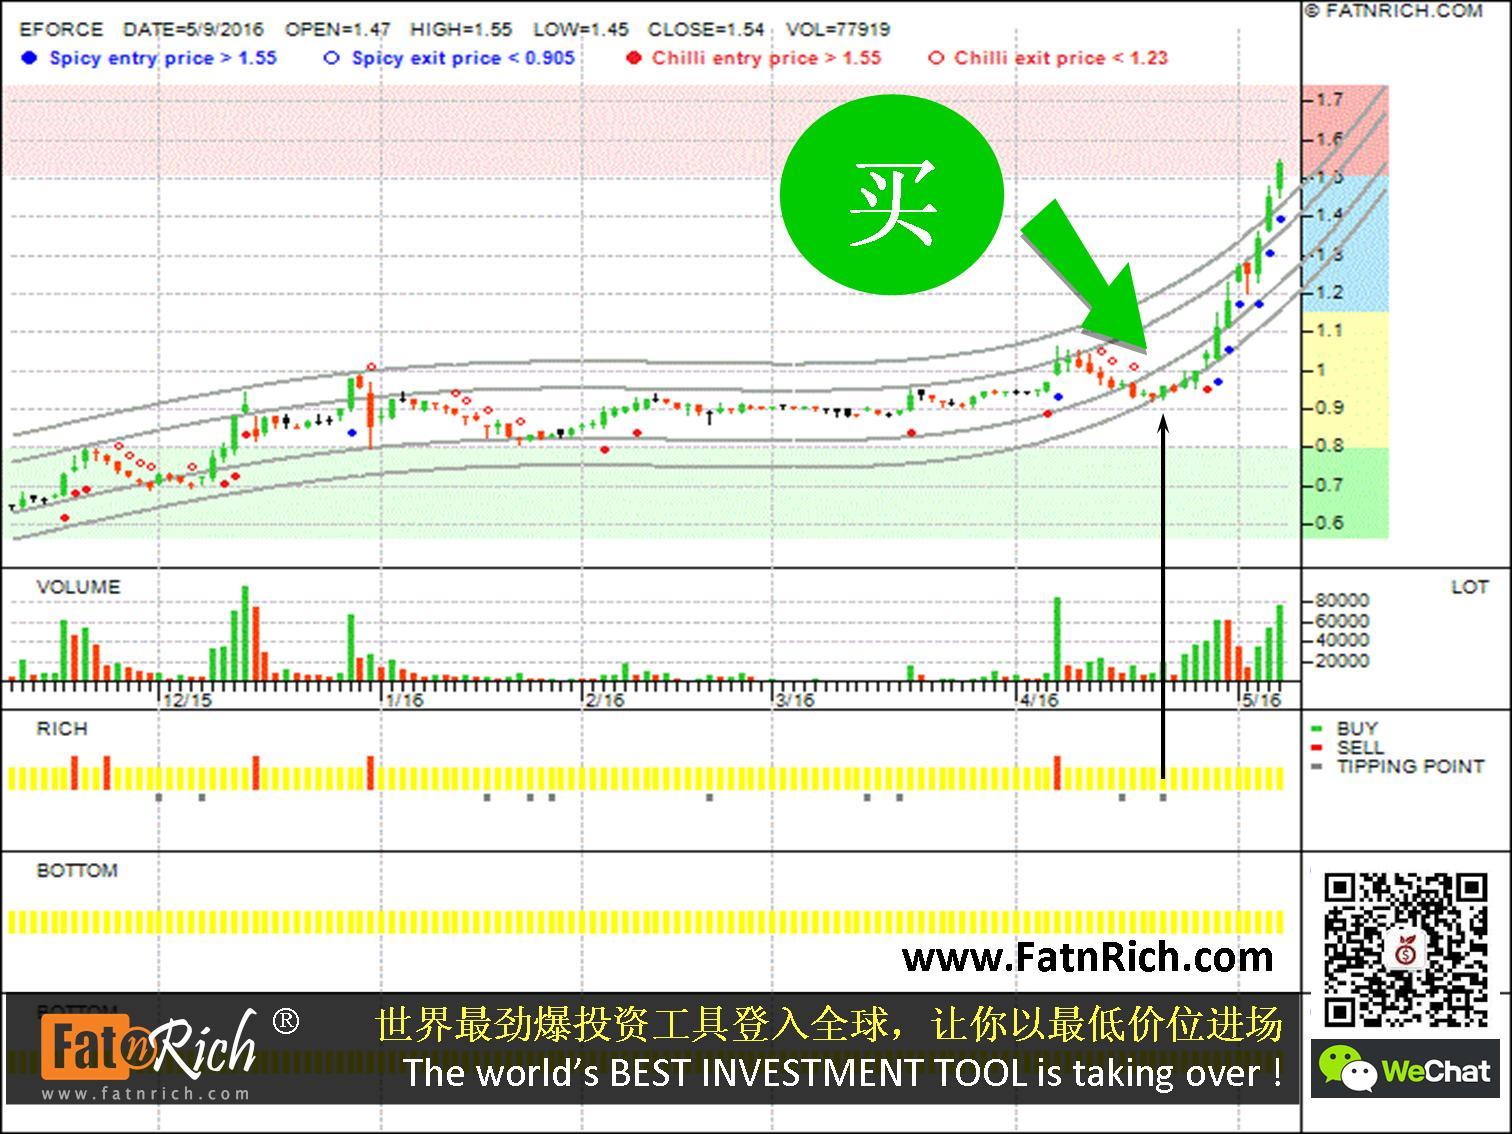 马来西亚股票力扬科技 EFORCE 0056(Excel Force Msc Berhad)